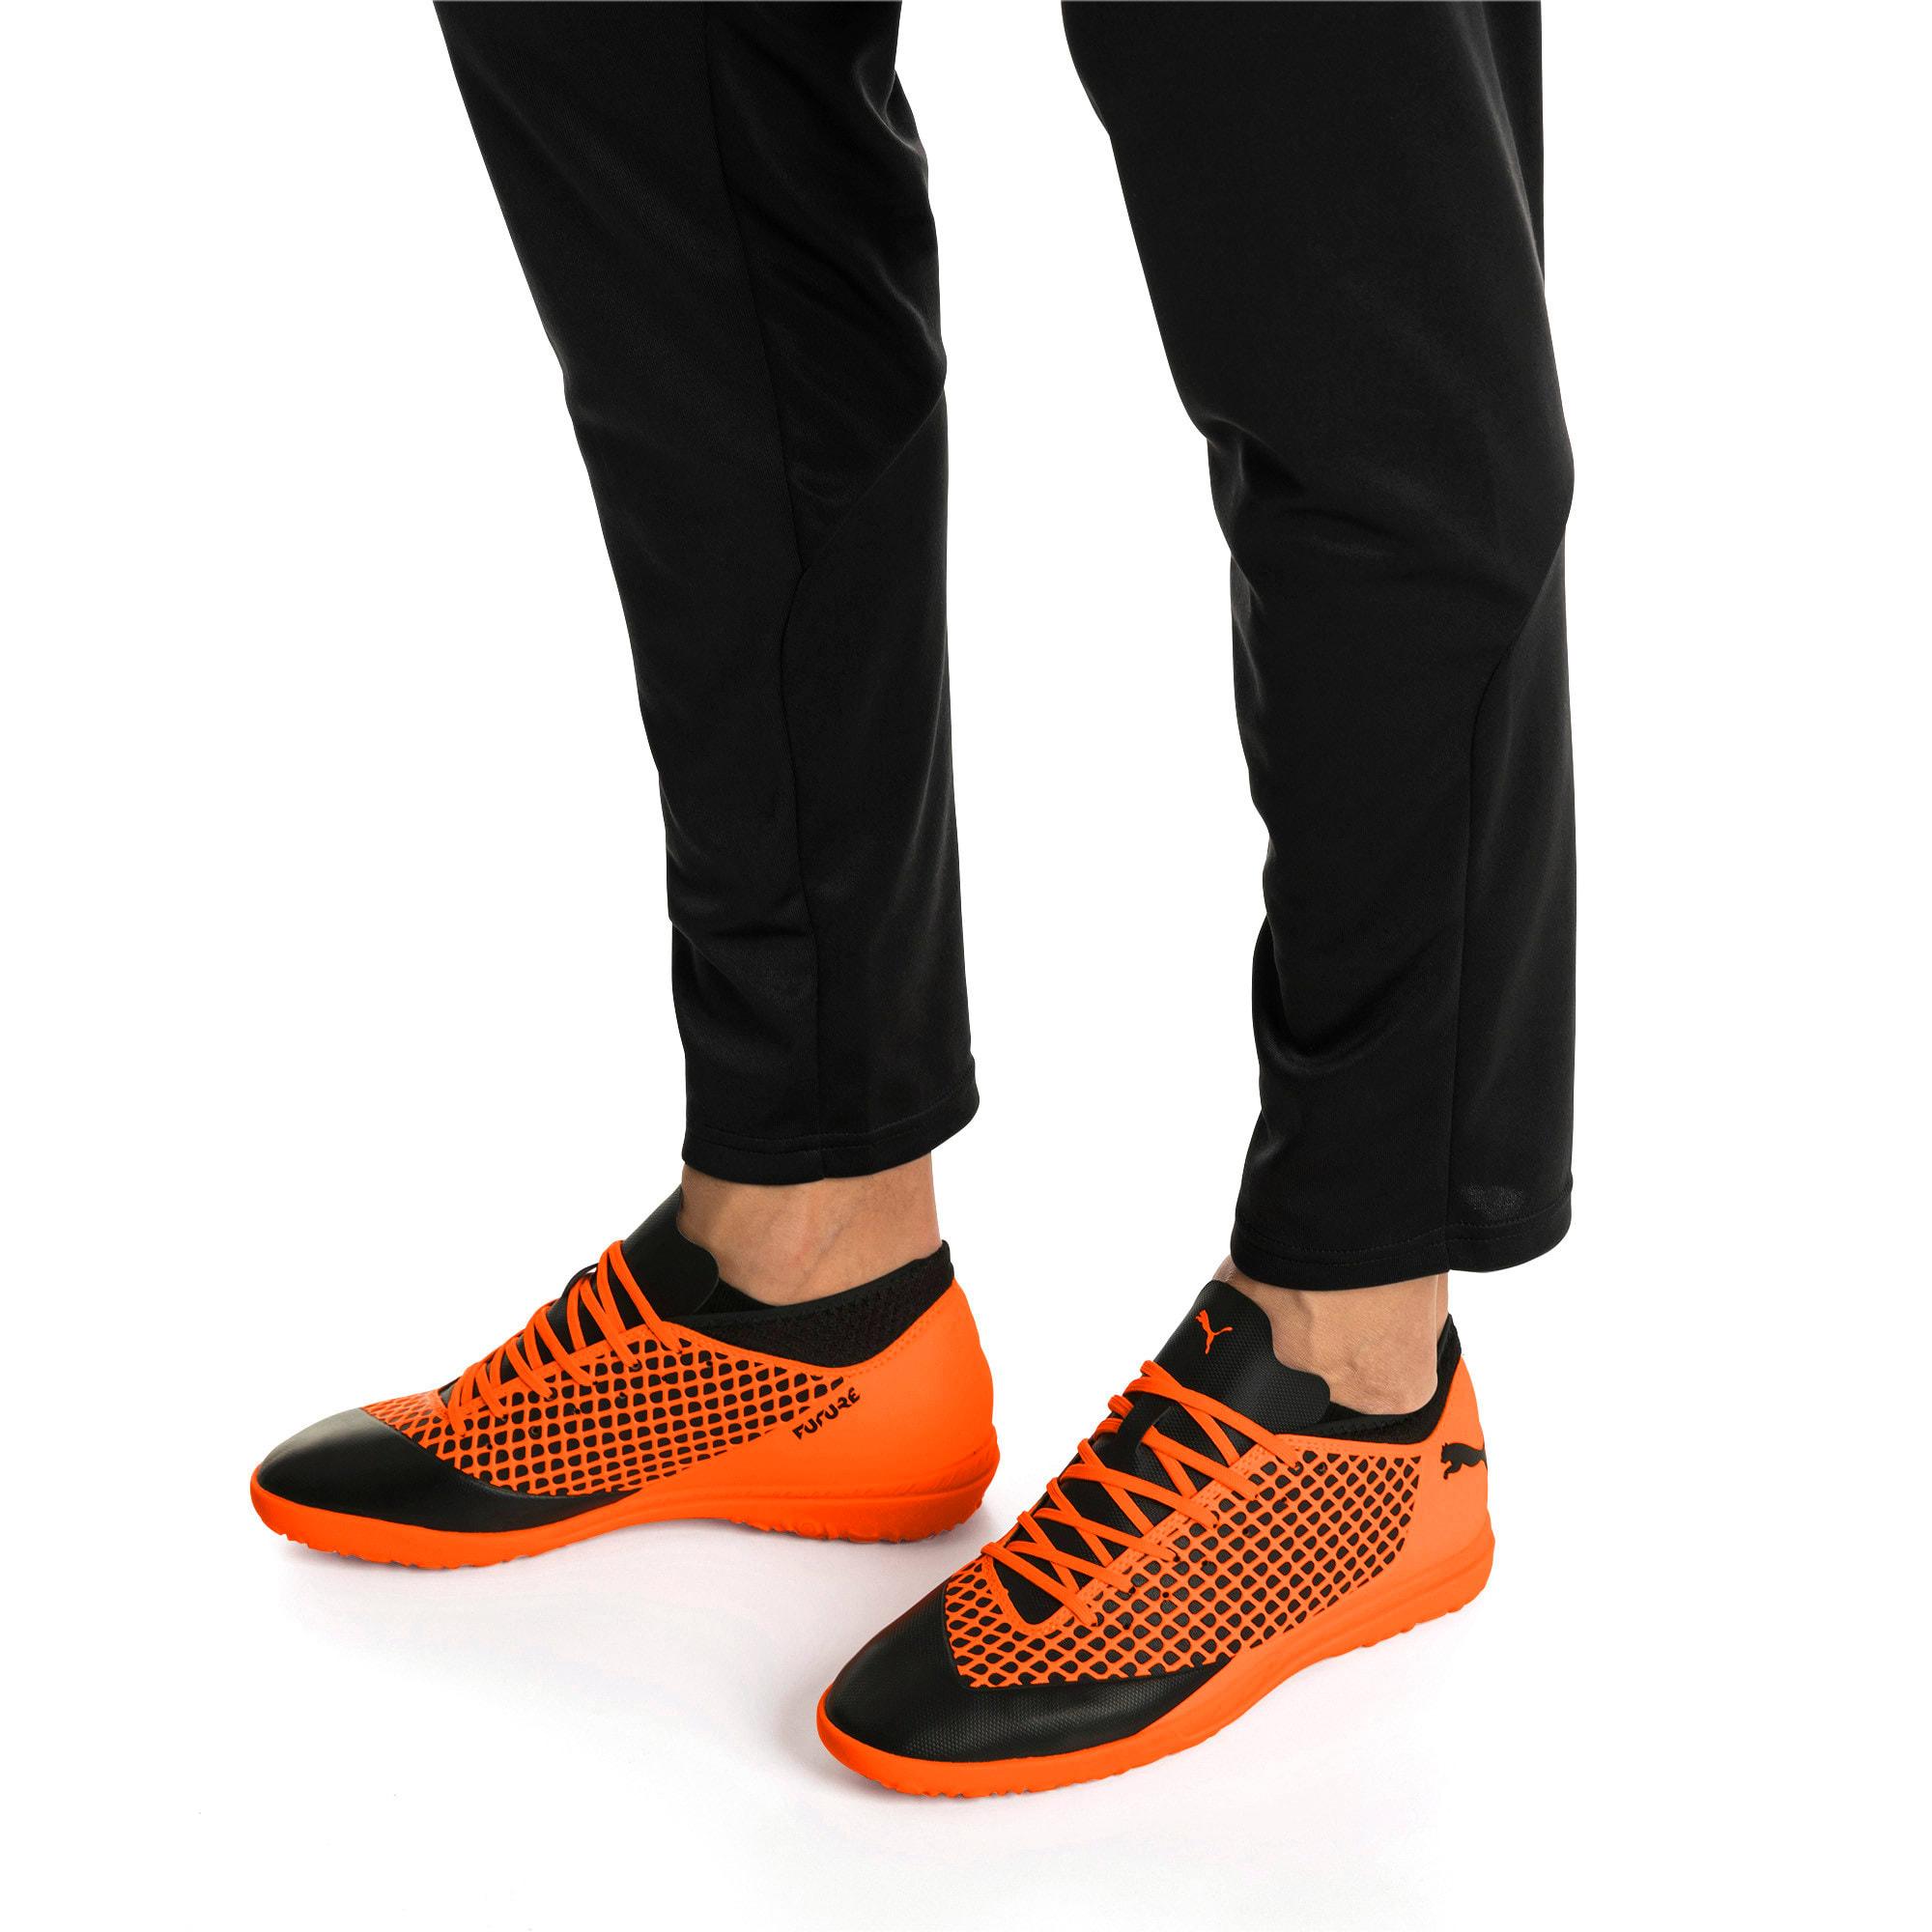 Thumbnail 7 of FUTURE 2.4 TT Men's Football Boots, Puma Black-Shocking Orange, medium-IND